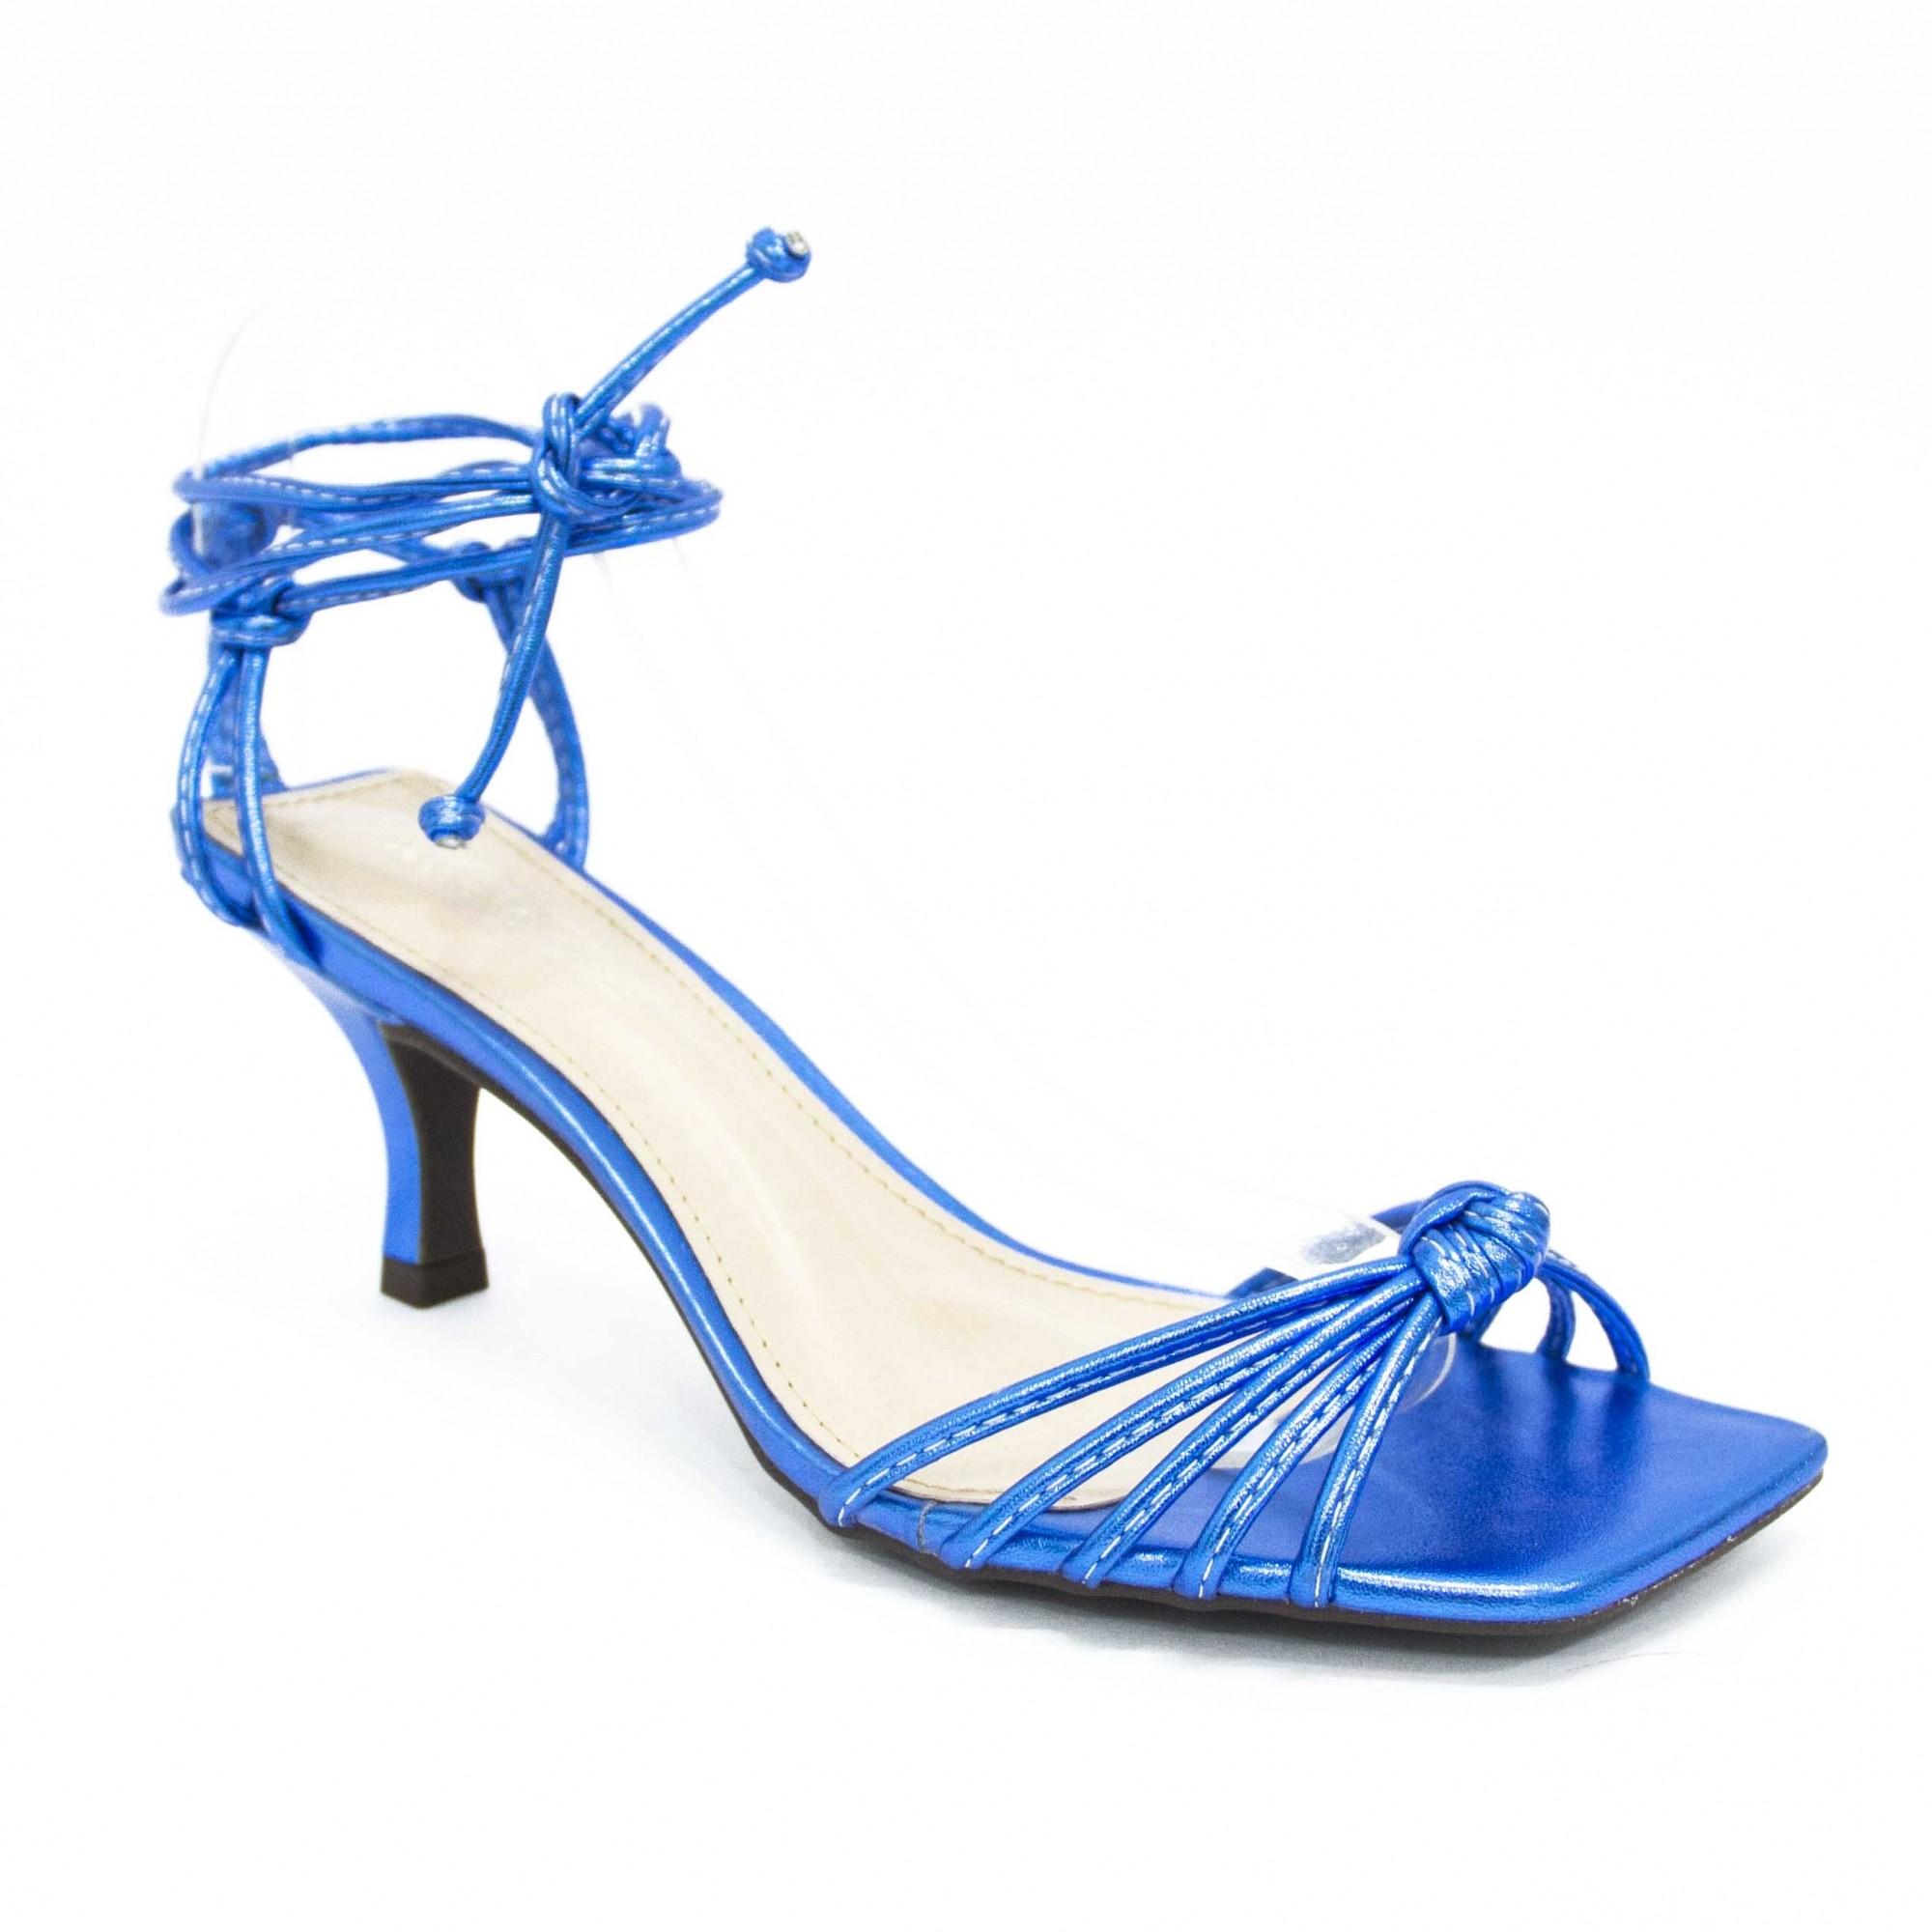 Sandália Maitê  Azul Metalizada by Deborah Munhoz